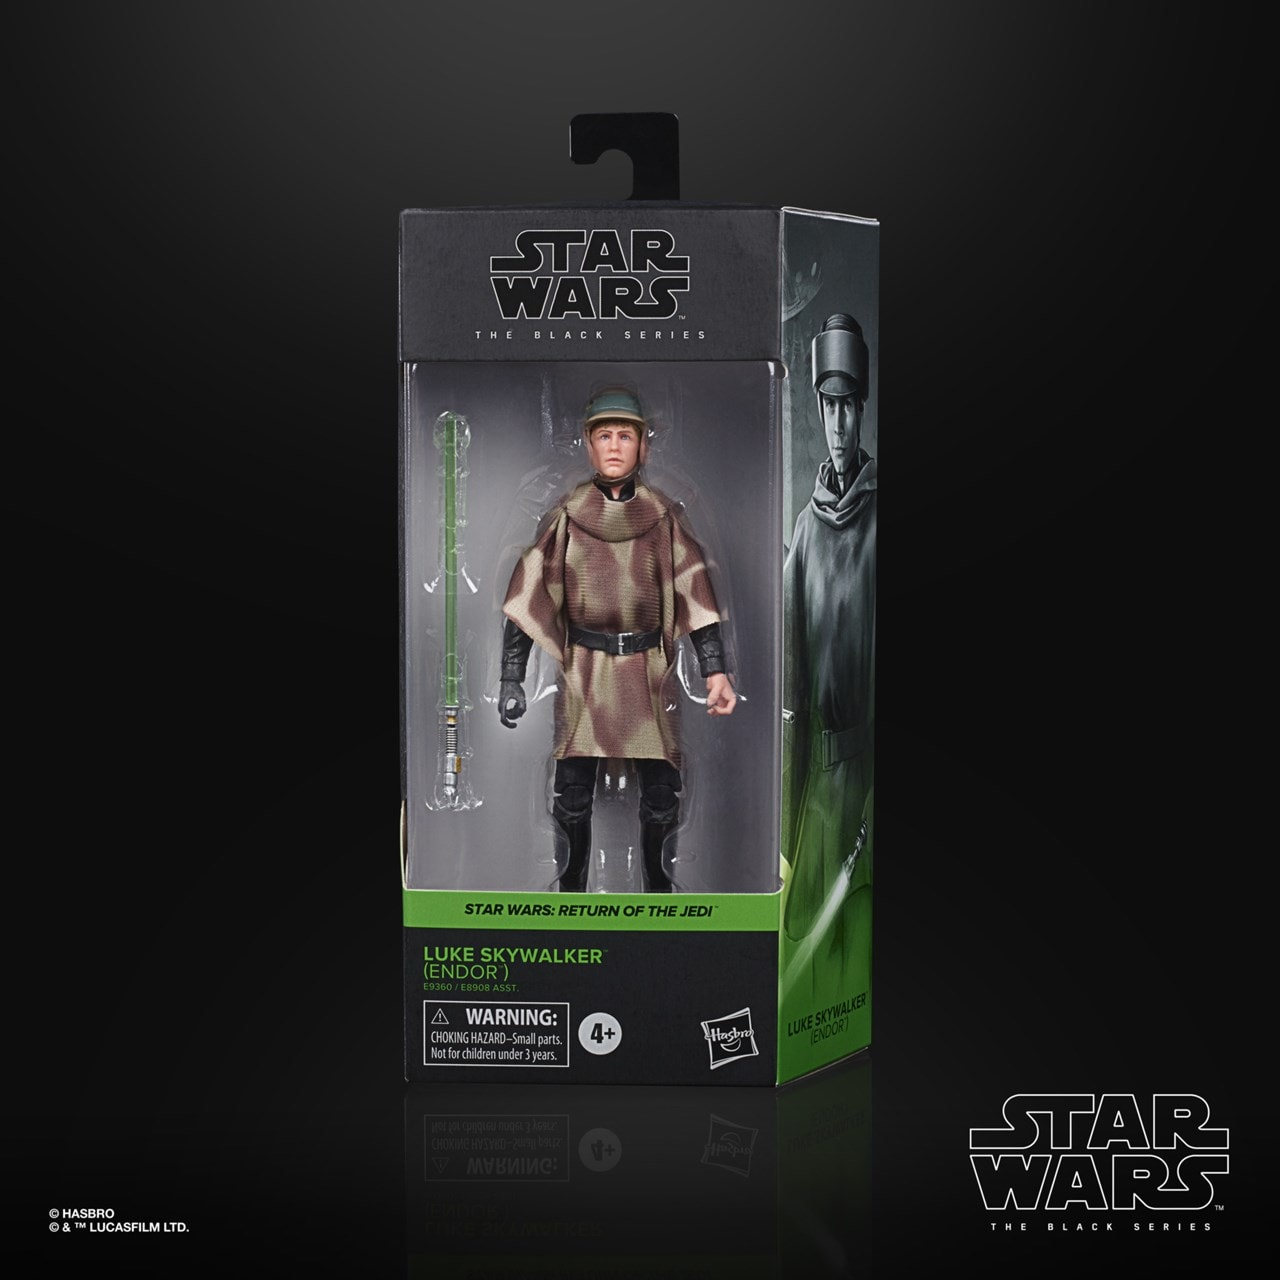 Luke Skywalker: Episode 6: The Black Series: Star Wars Action Figure - 4